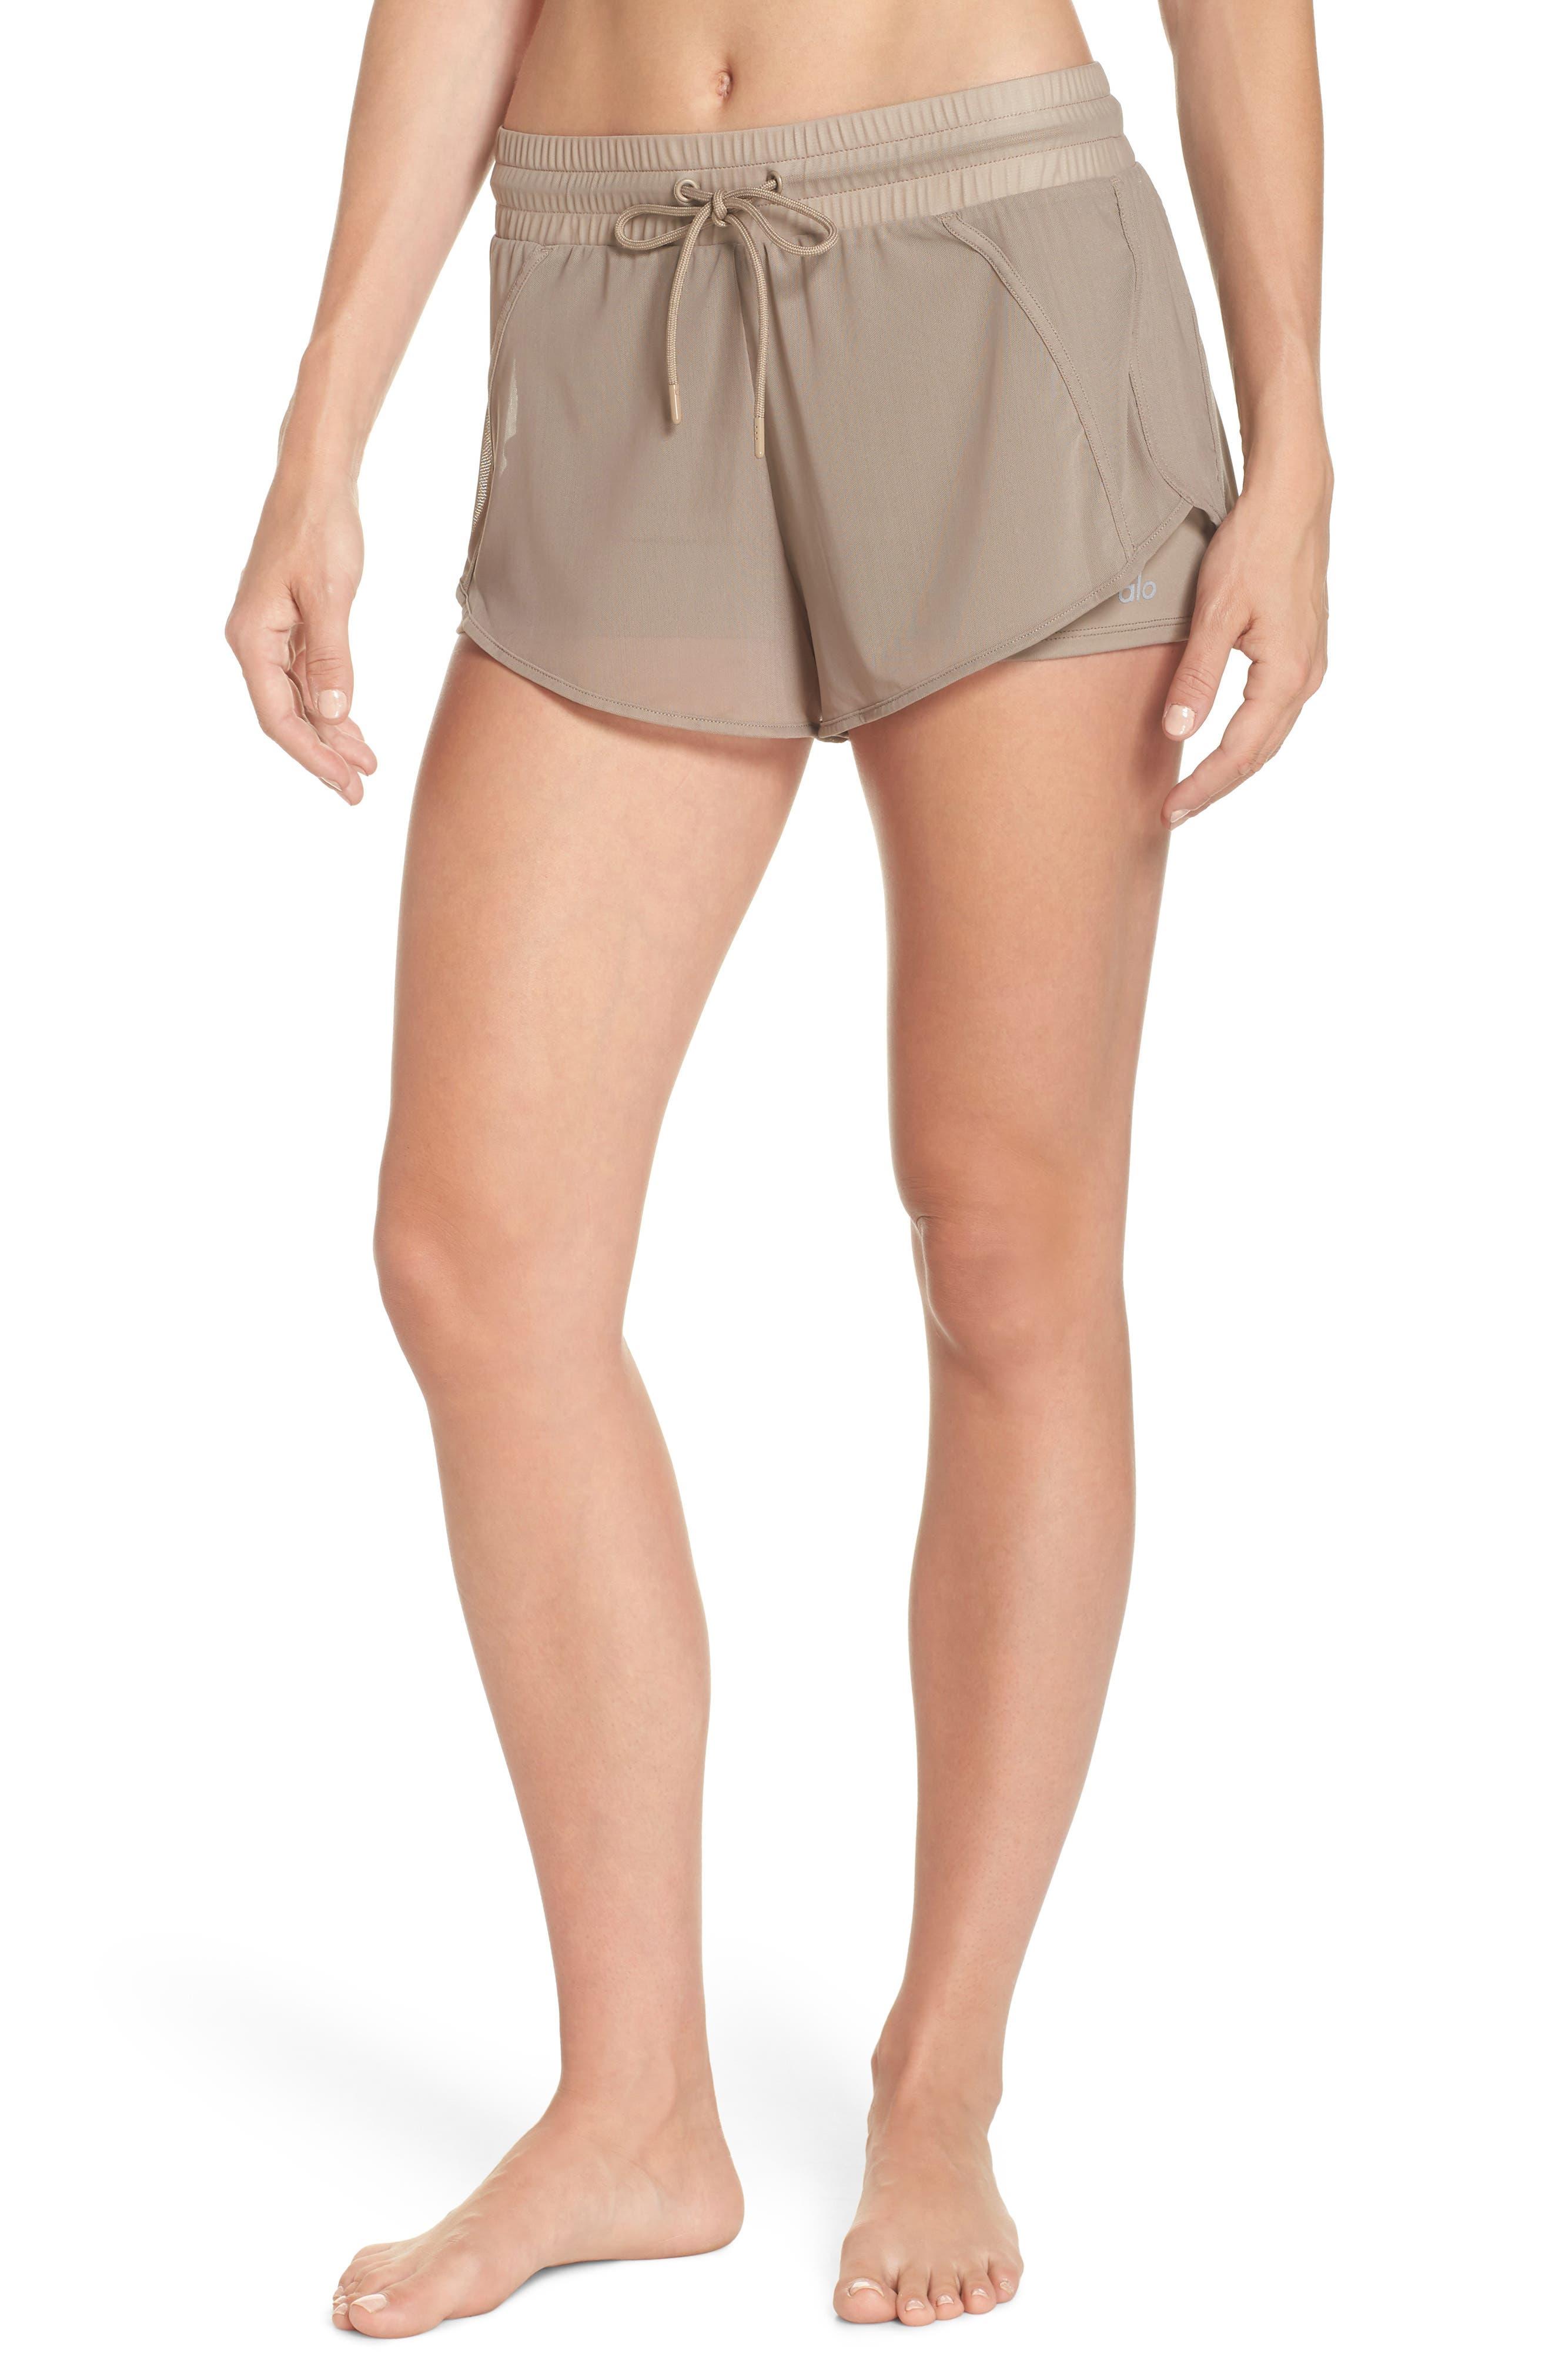 Ambience Shorts,                         Main,                         color, Gravel